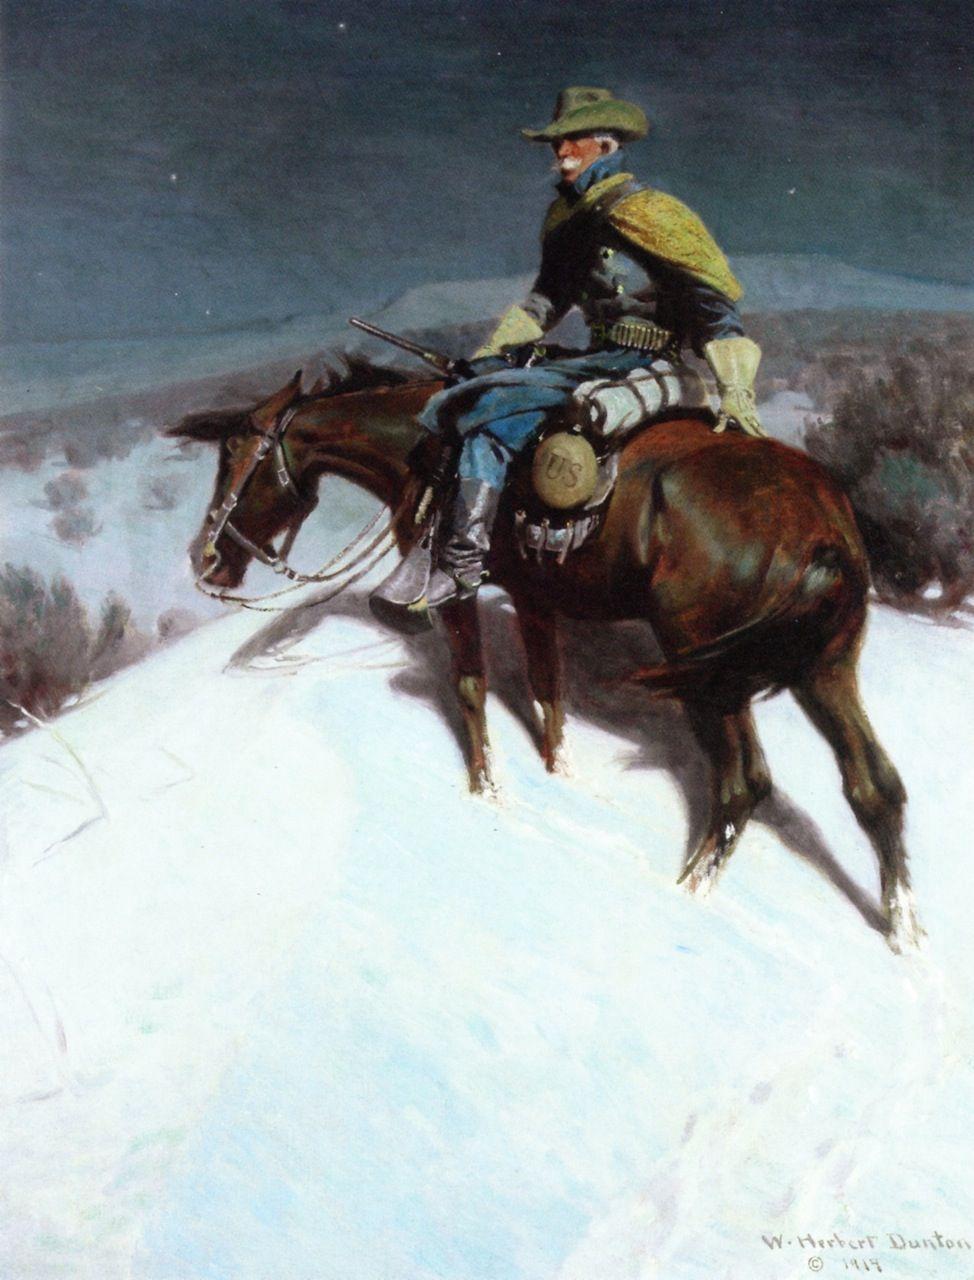 The Vidette - Custer Trooper (W. Herbert Dunton - 1914)